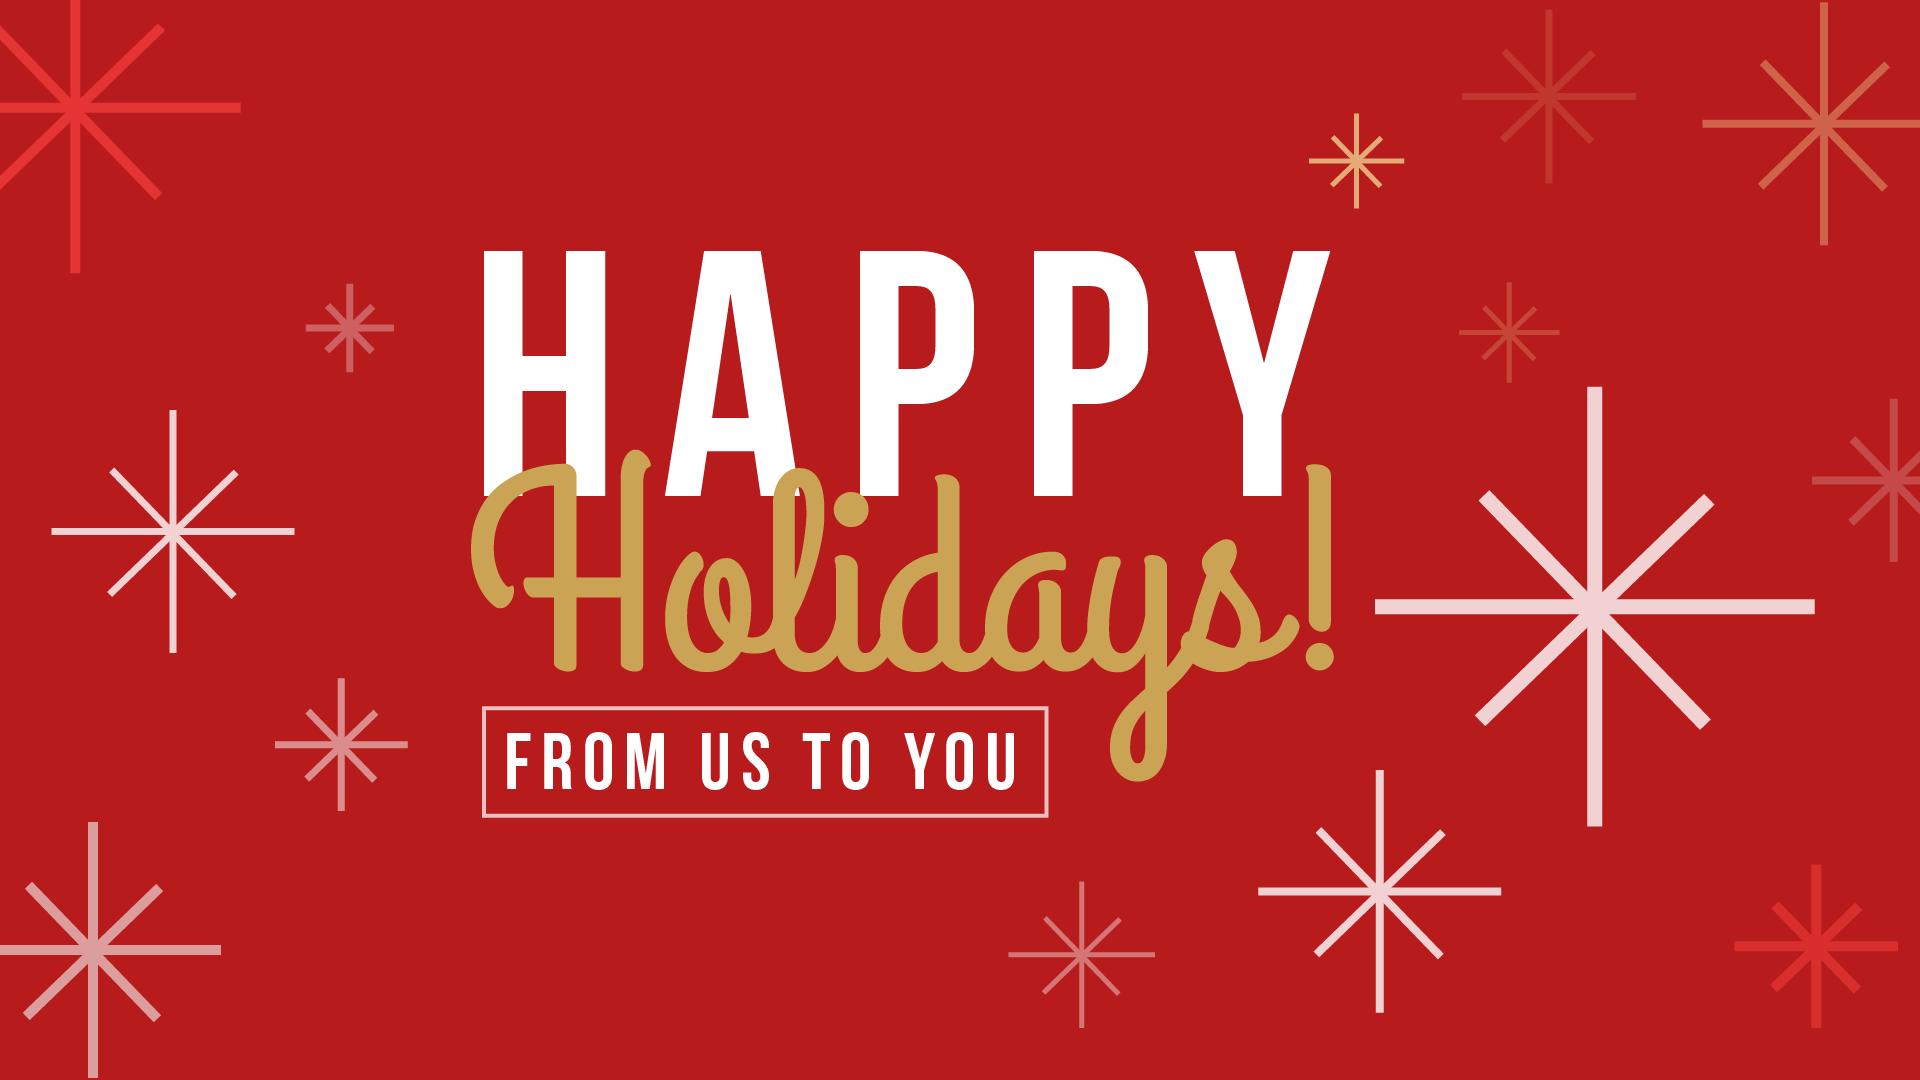 Happy Holidays 01 Digital Signage